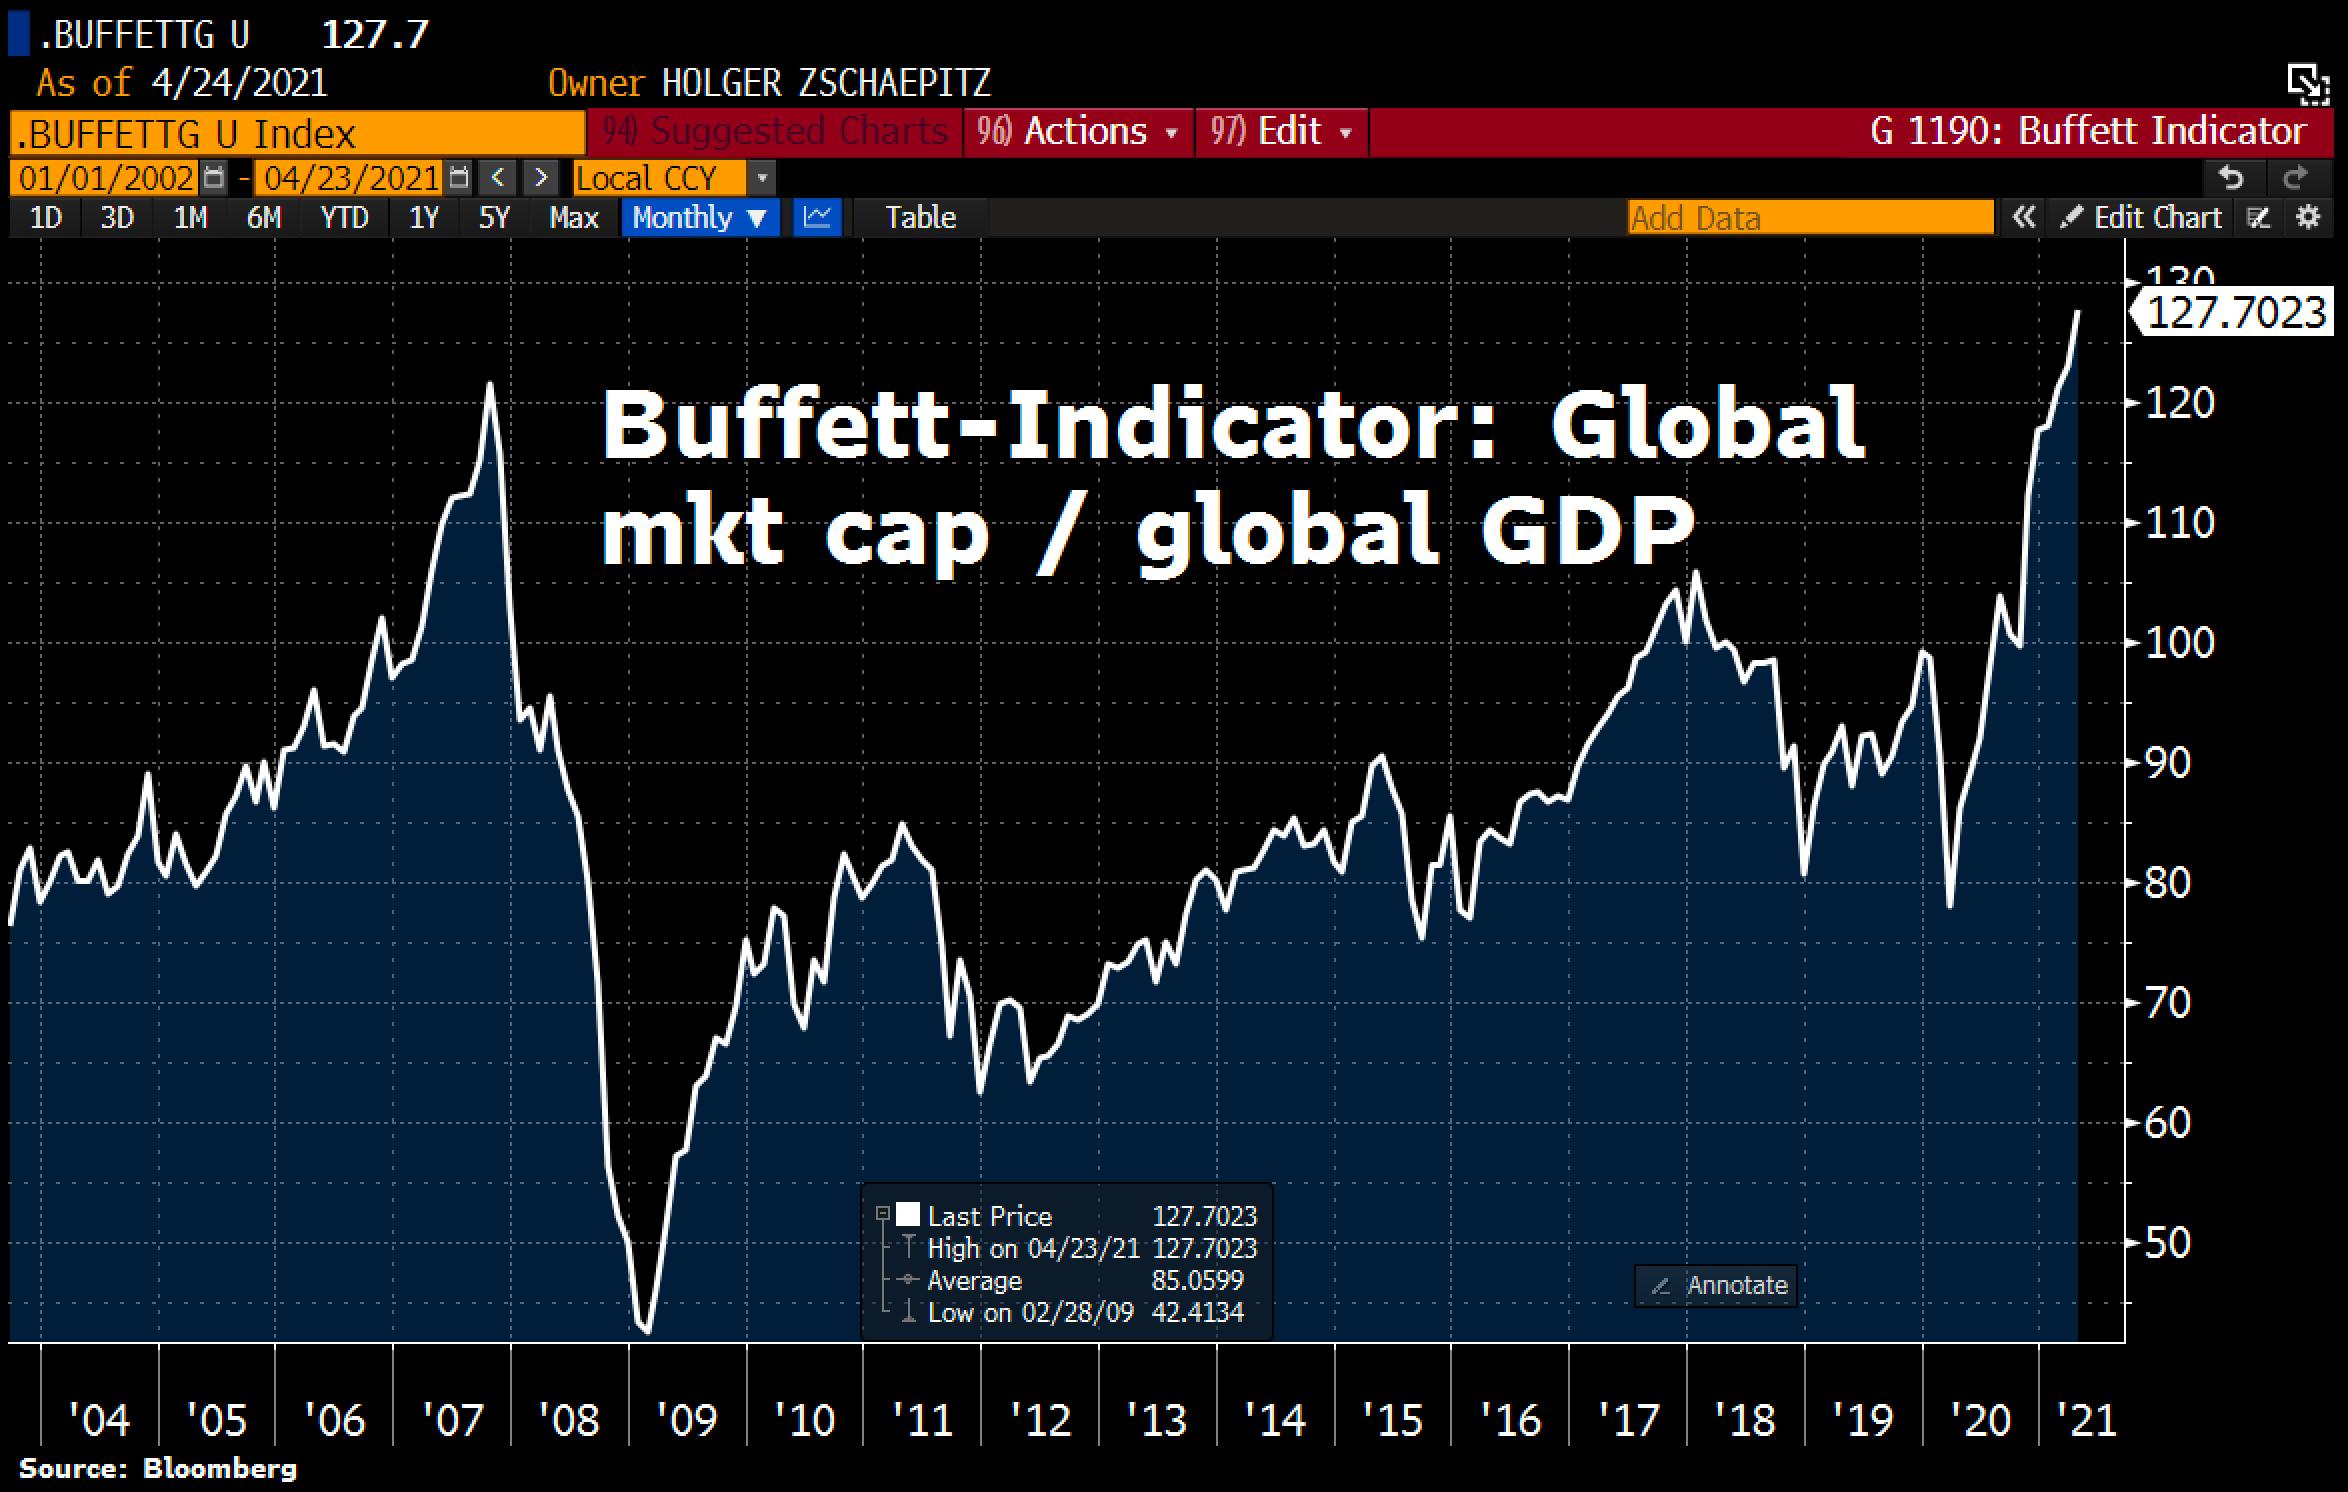 Global Market Cap / Global GDP